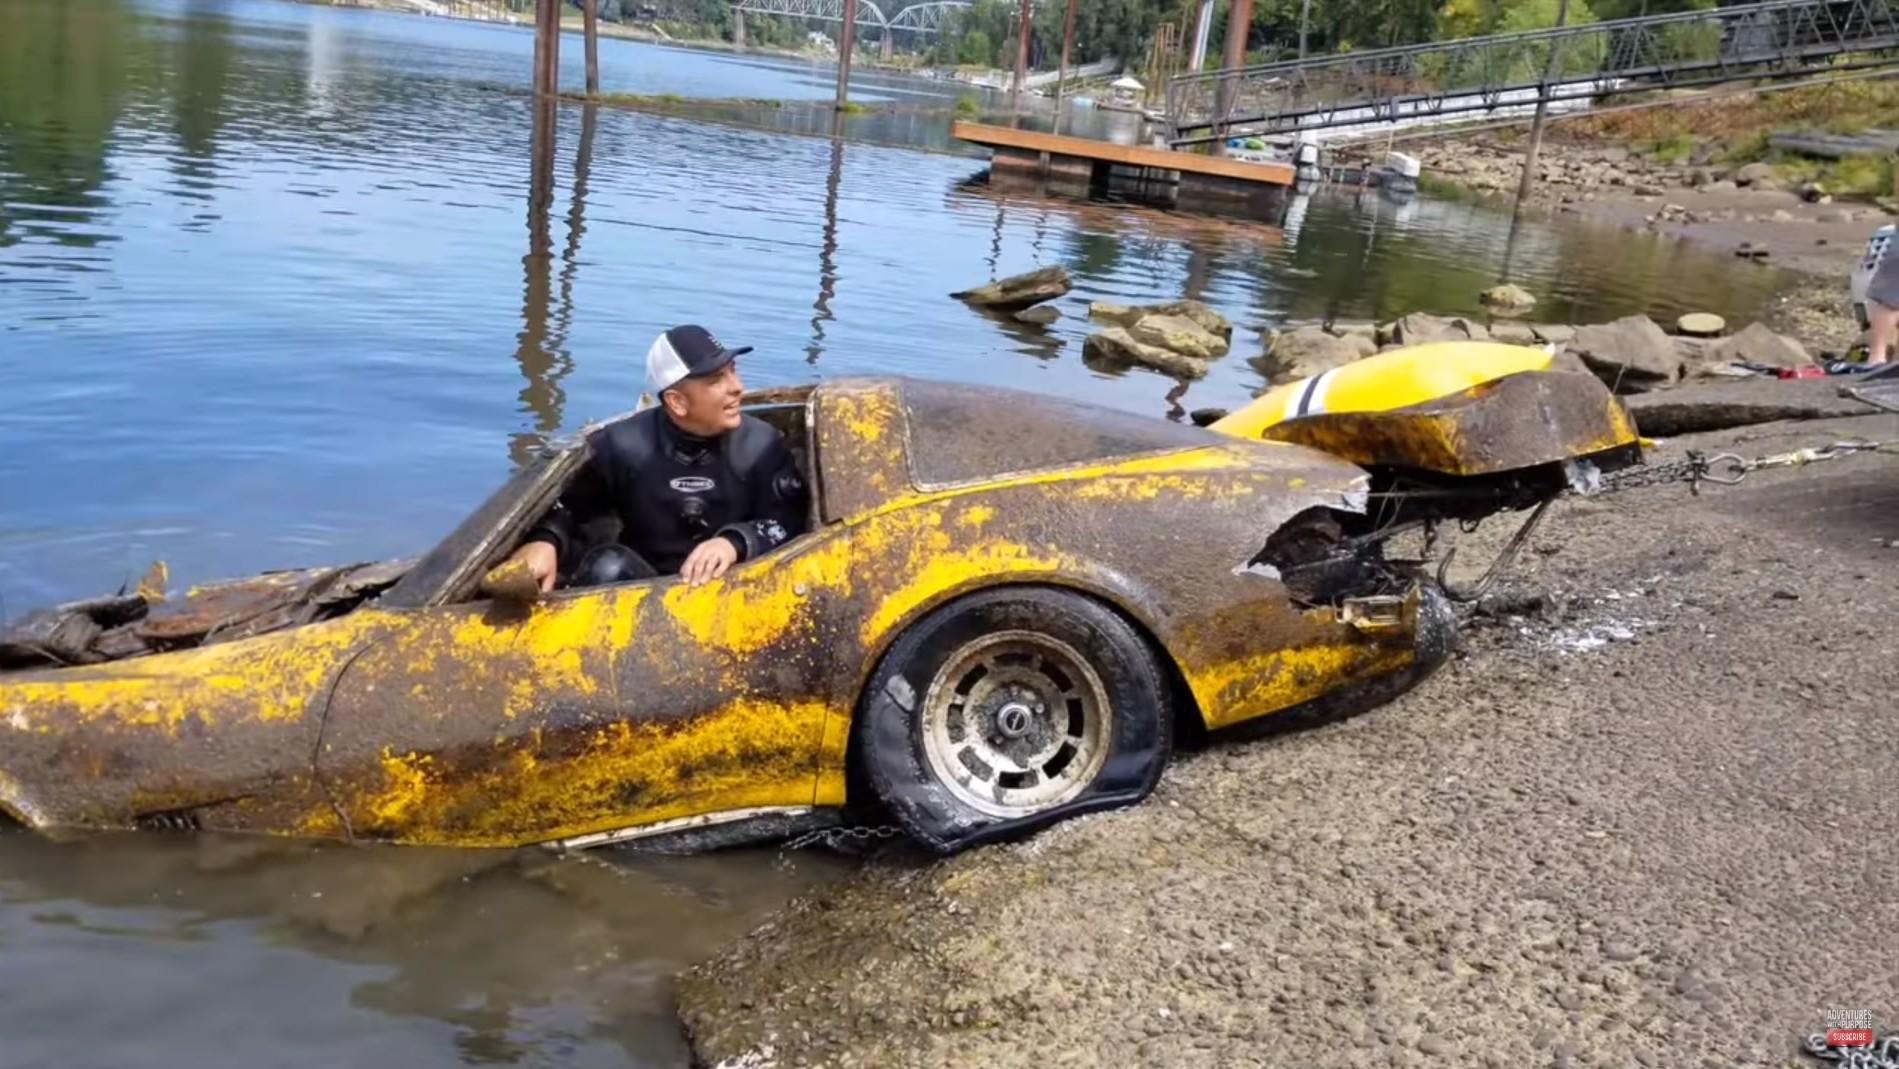 В реке нашли утонувший 20 лет назад спорткар Corvette